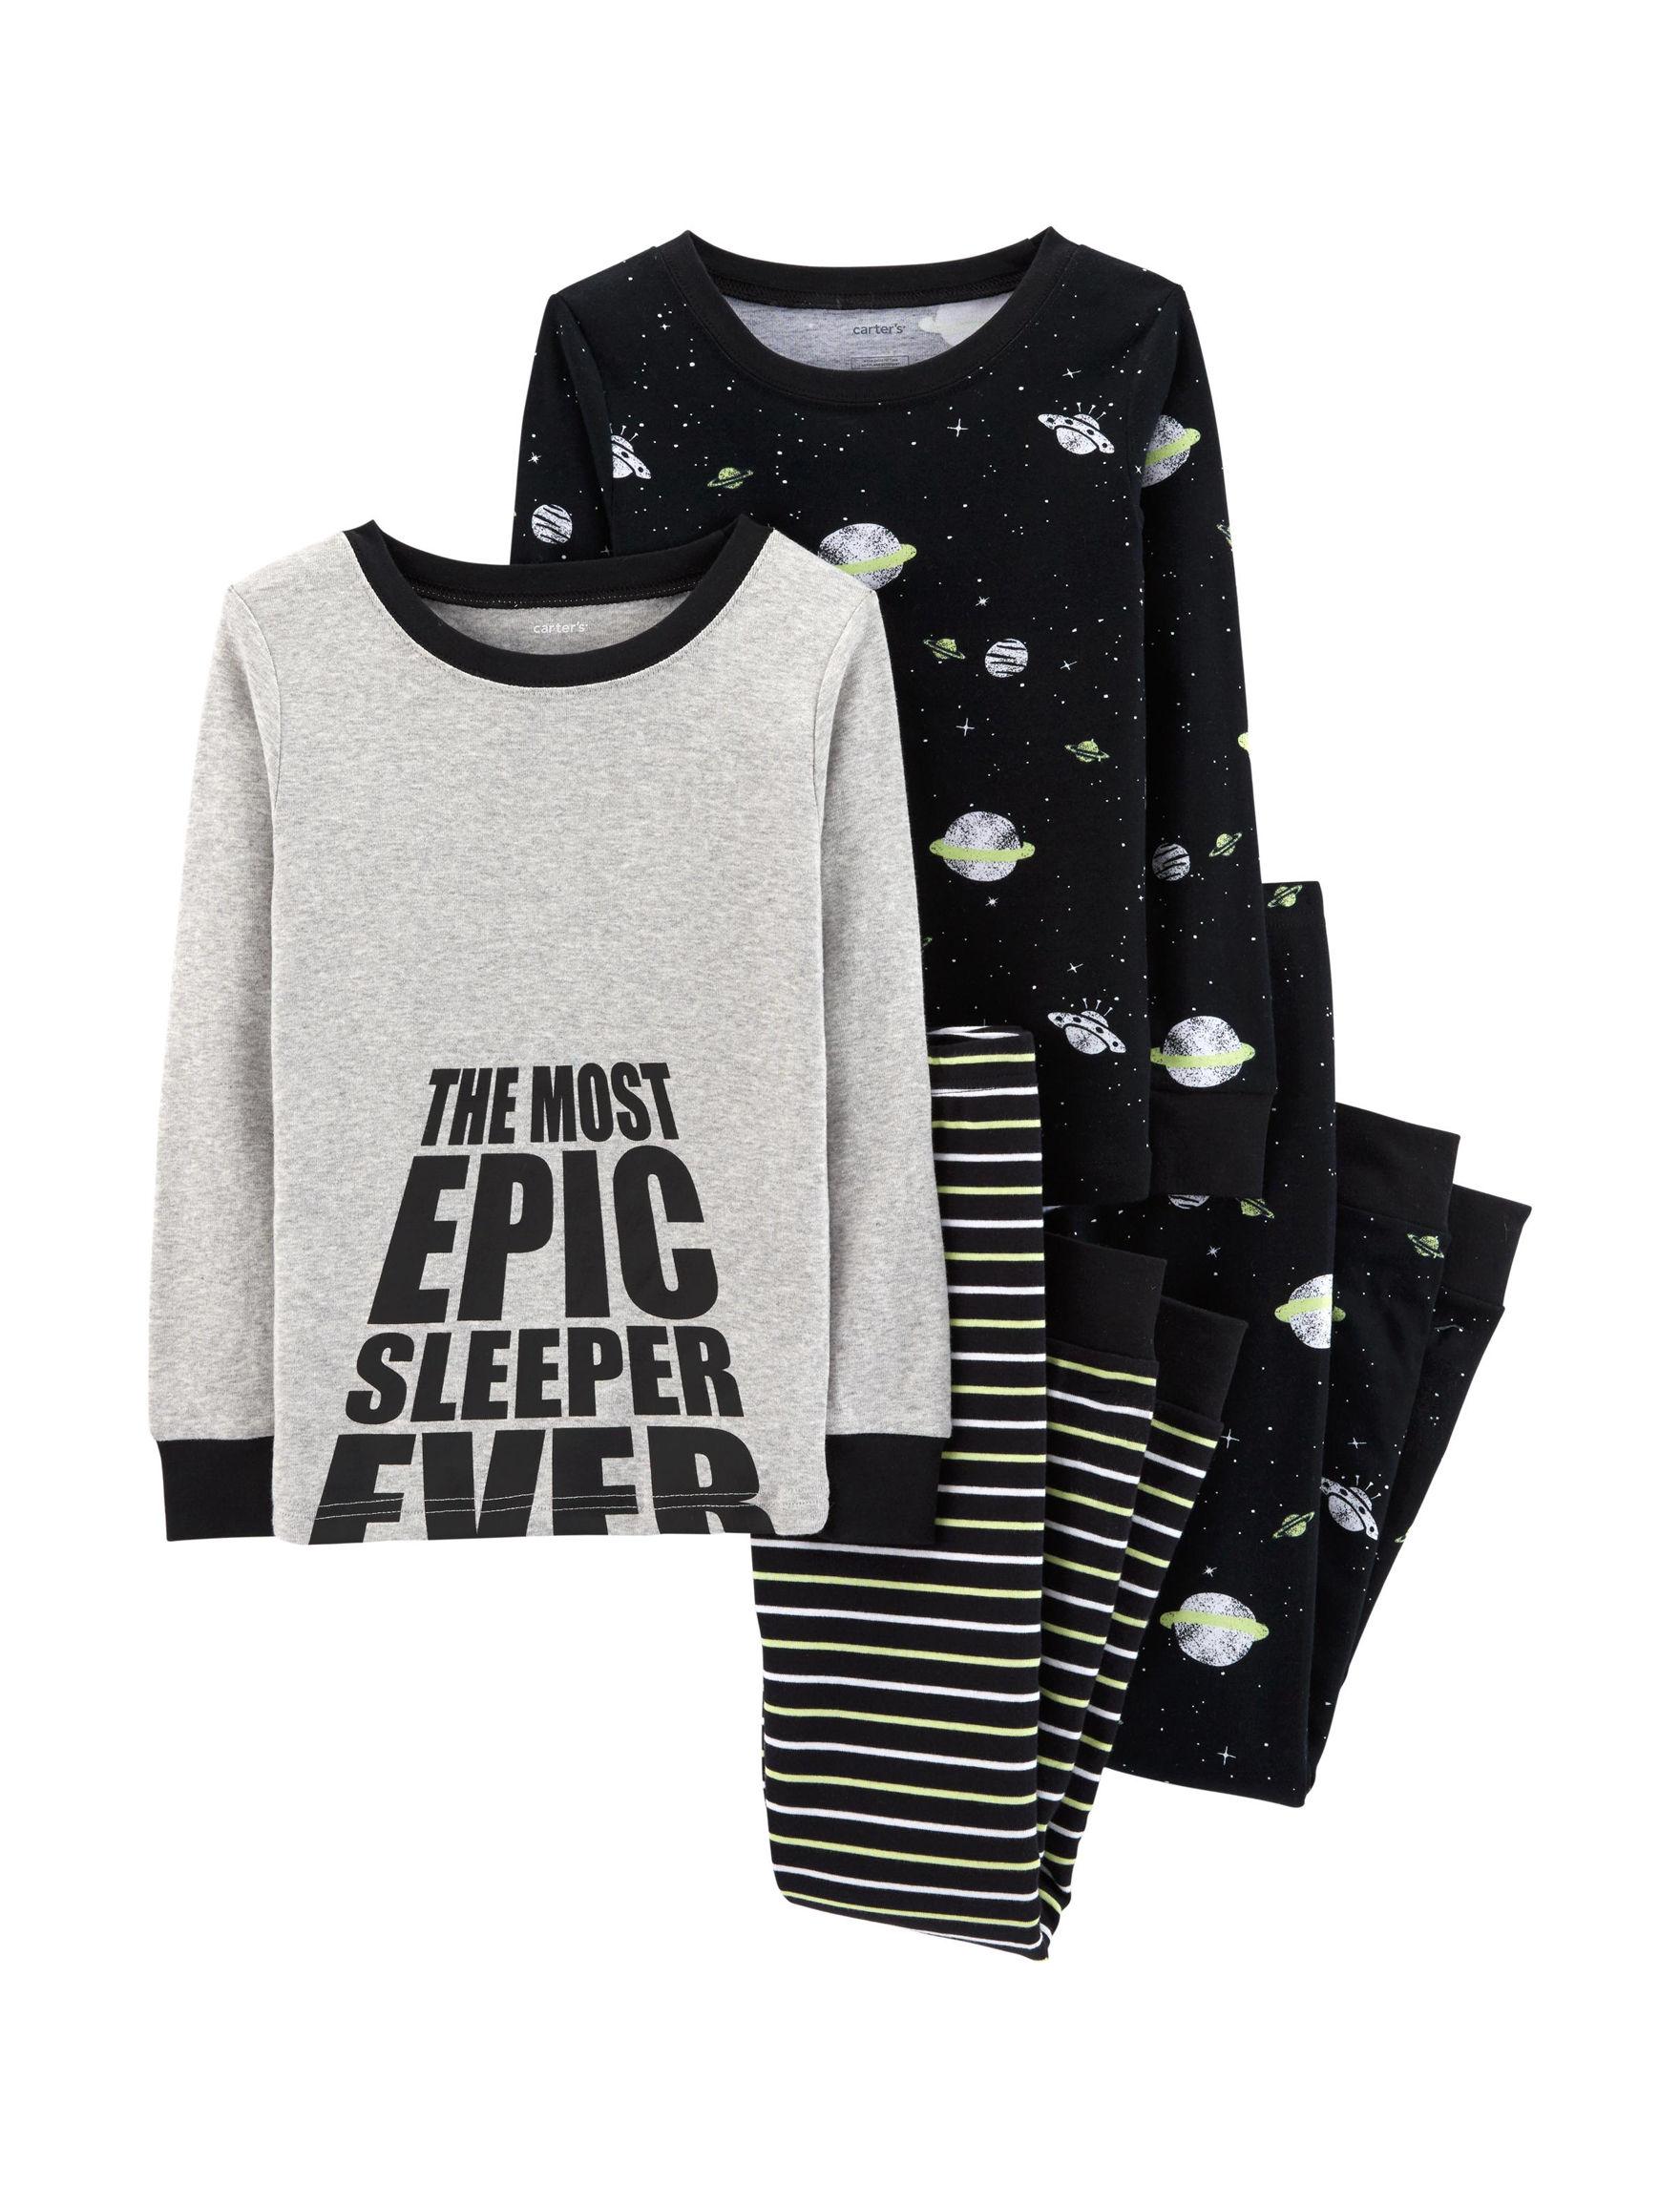 Carter's Black / Grey Pajama Sets